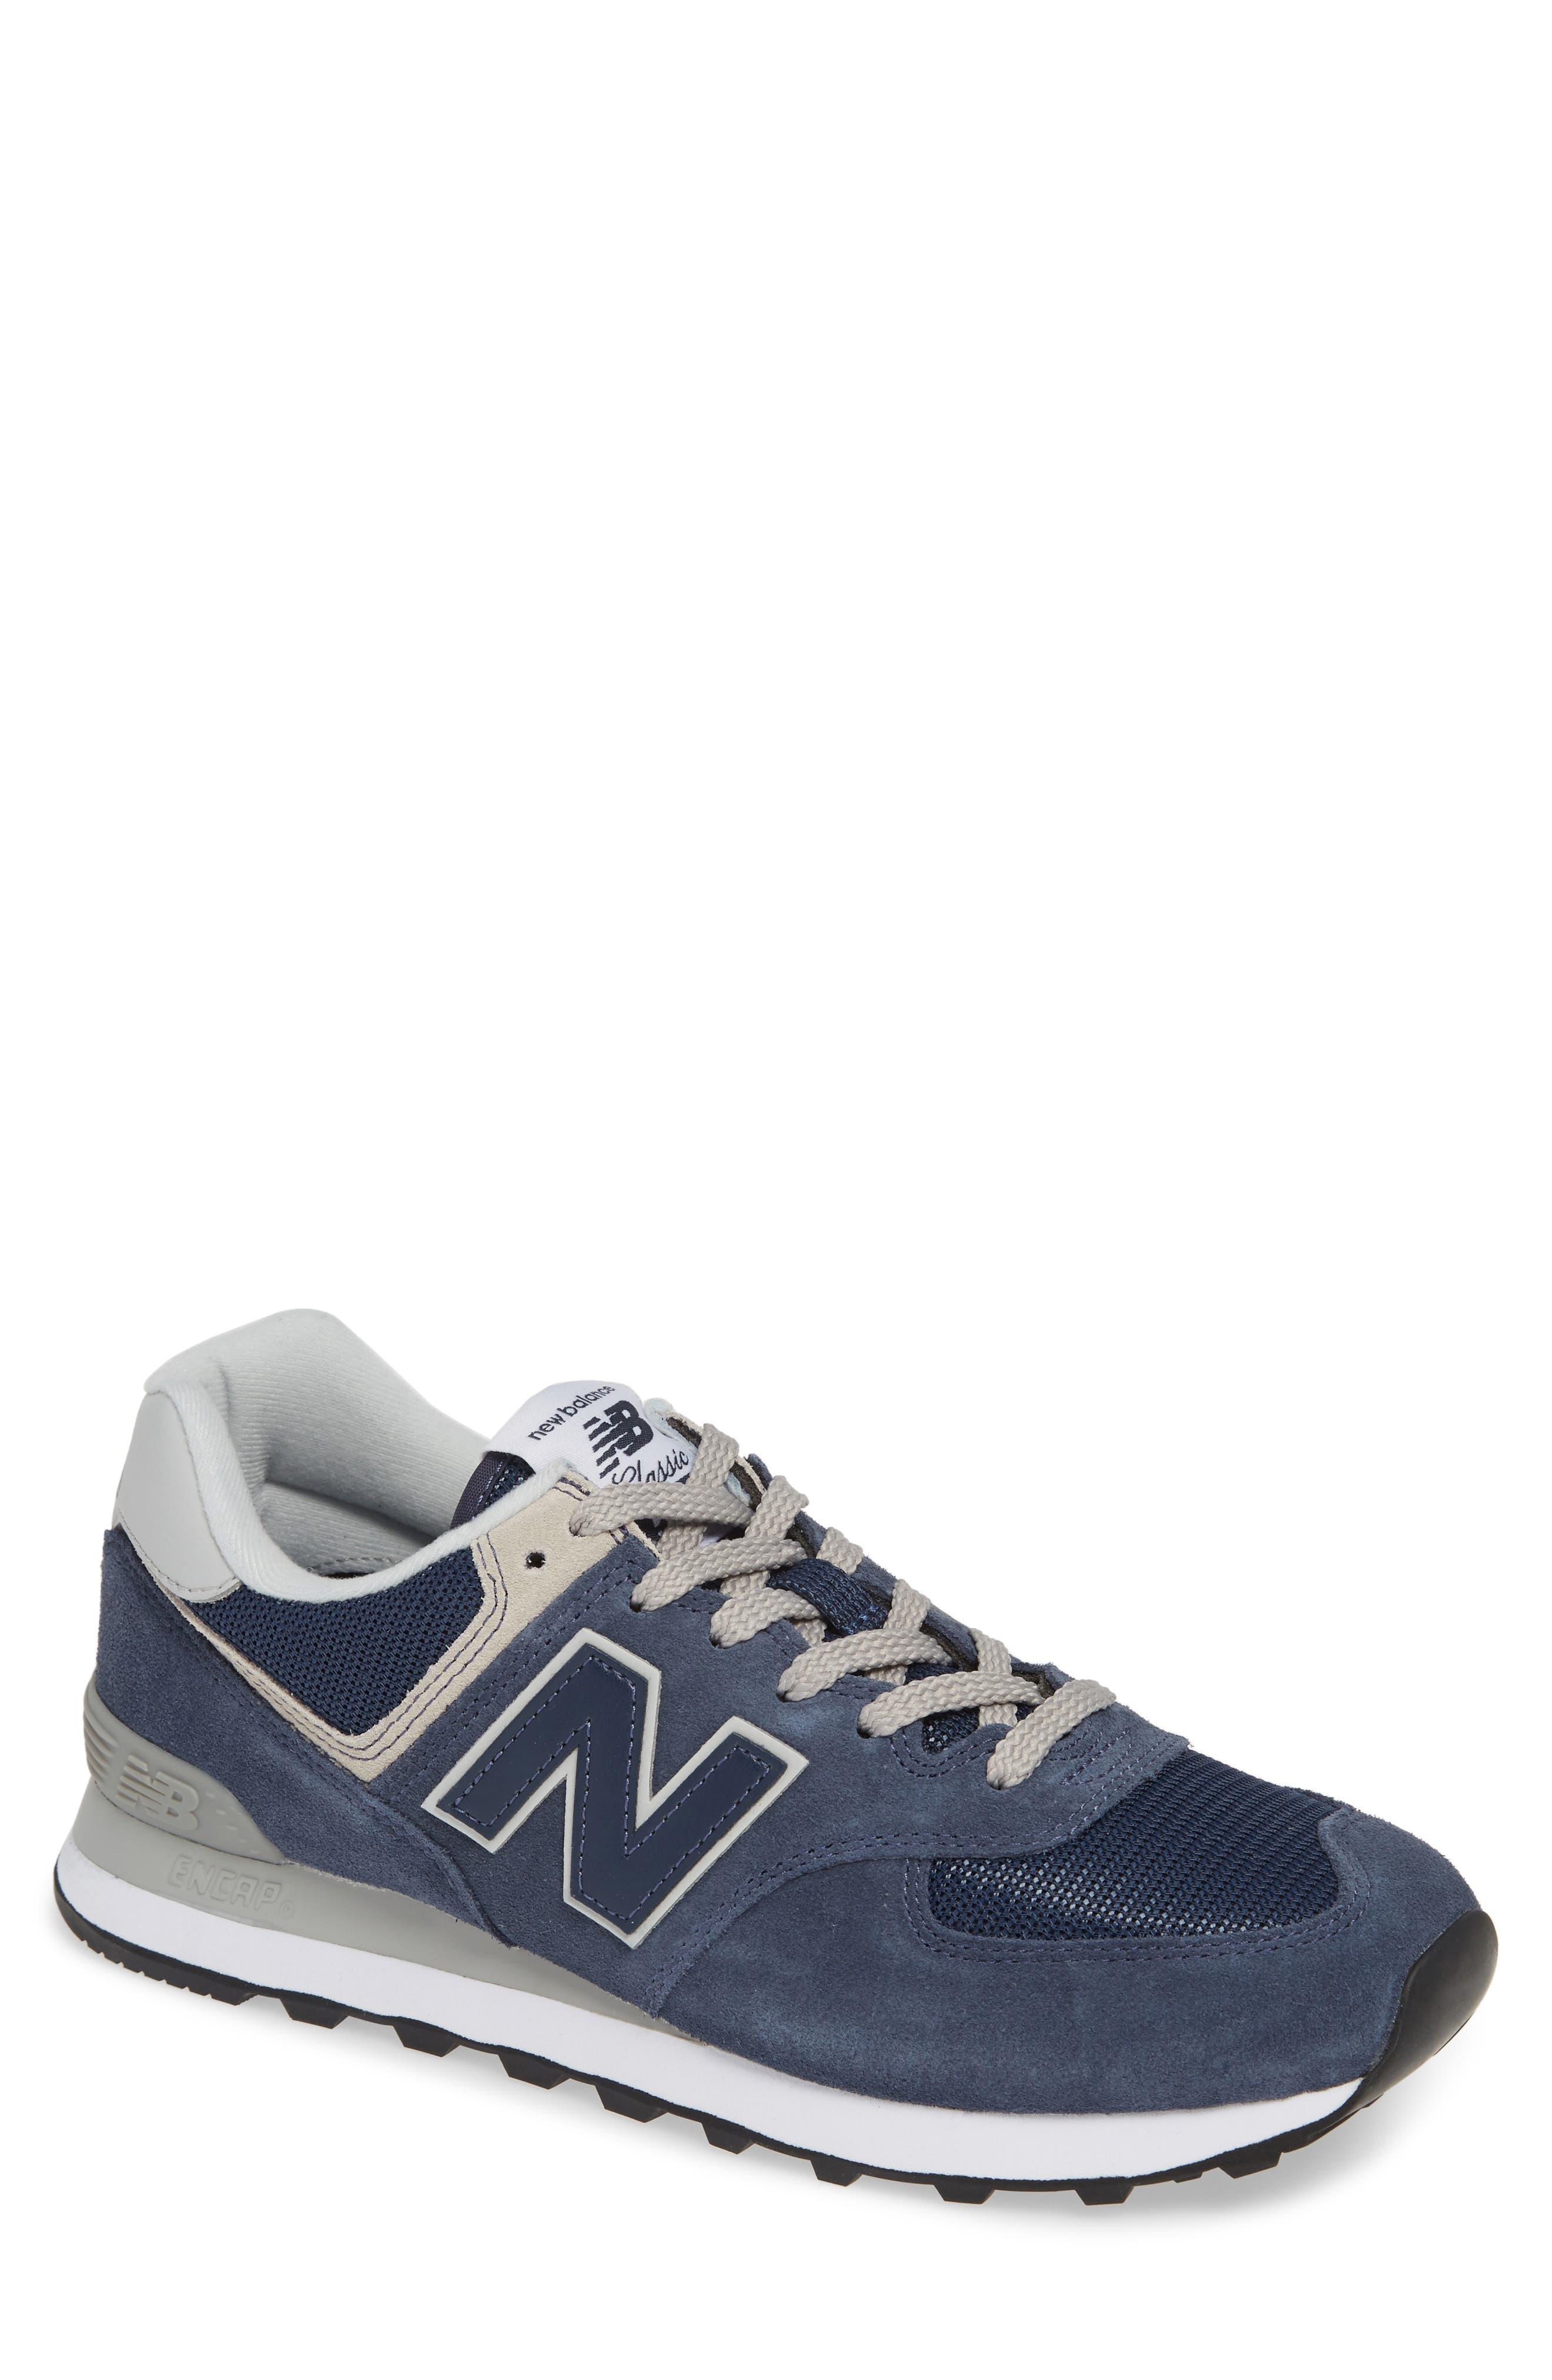 NEW BALANCE, 574 Classic Sneaker, Main thumbnail 1, color, BLACK IRIS